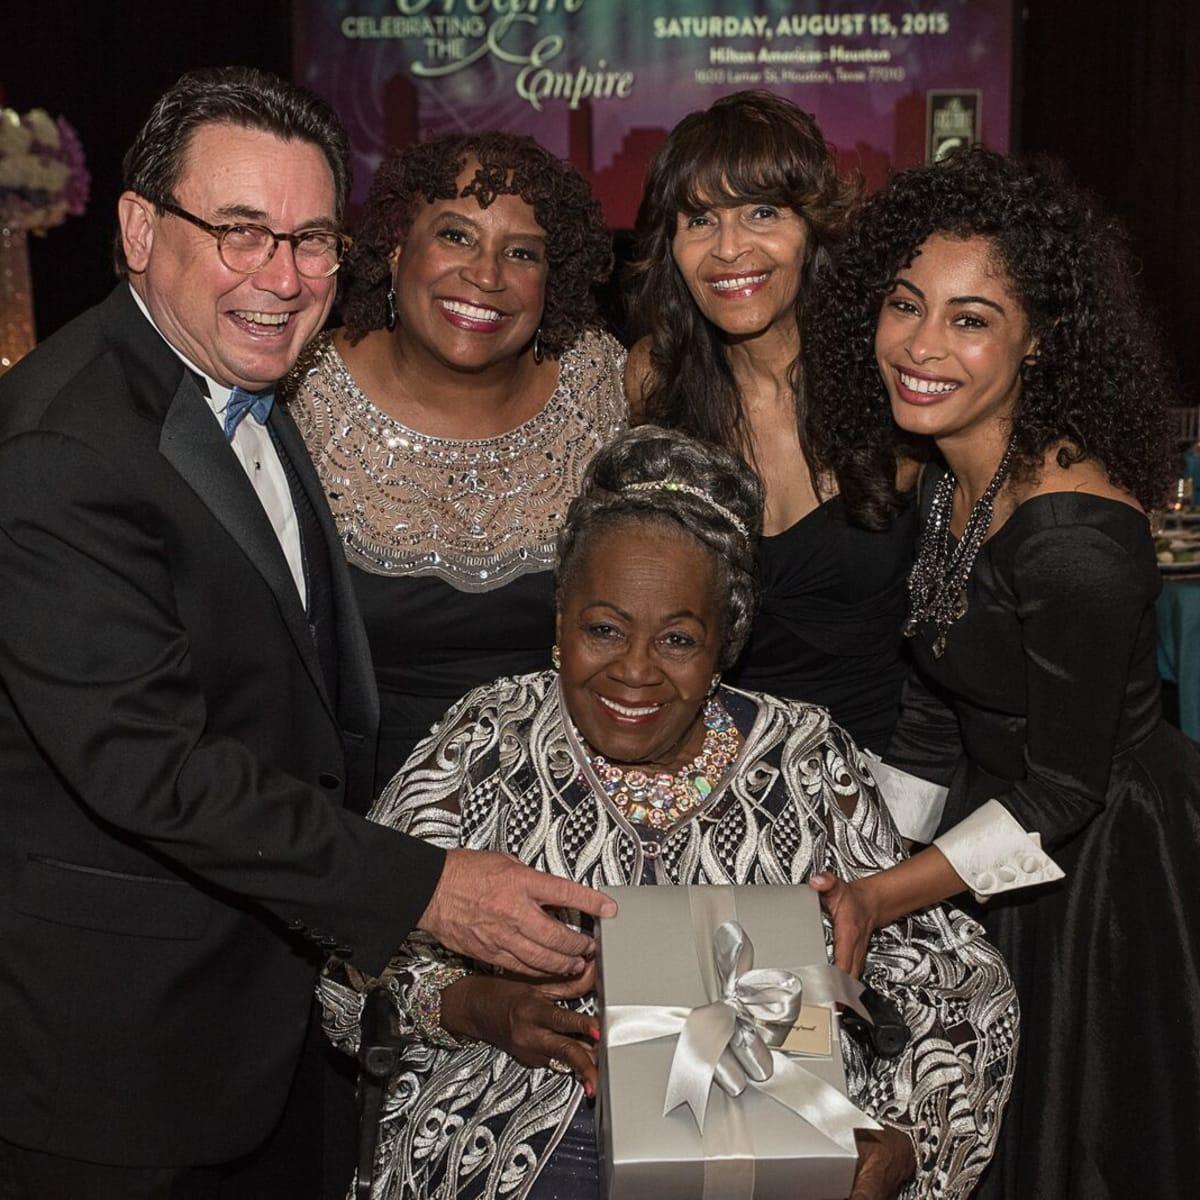 News, Shelby, Ensemble Theatre gala, Aug. 2015, Dan Domeracki, Eileen Morris, Janette Cosley, Katlynn Simone, seated Irma P. Hall